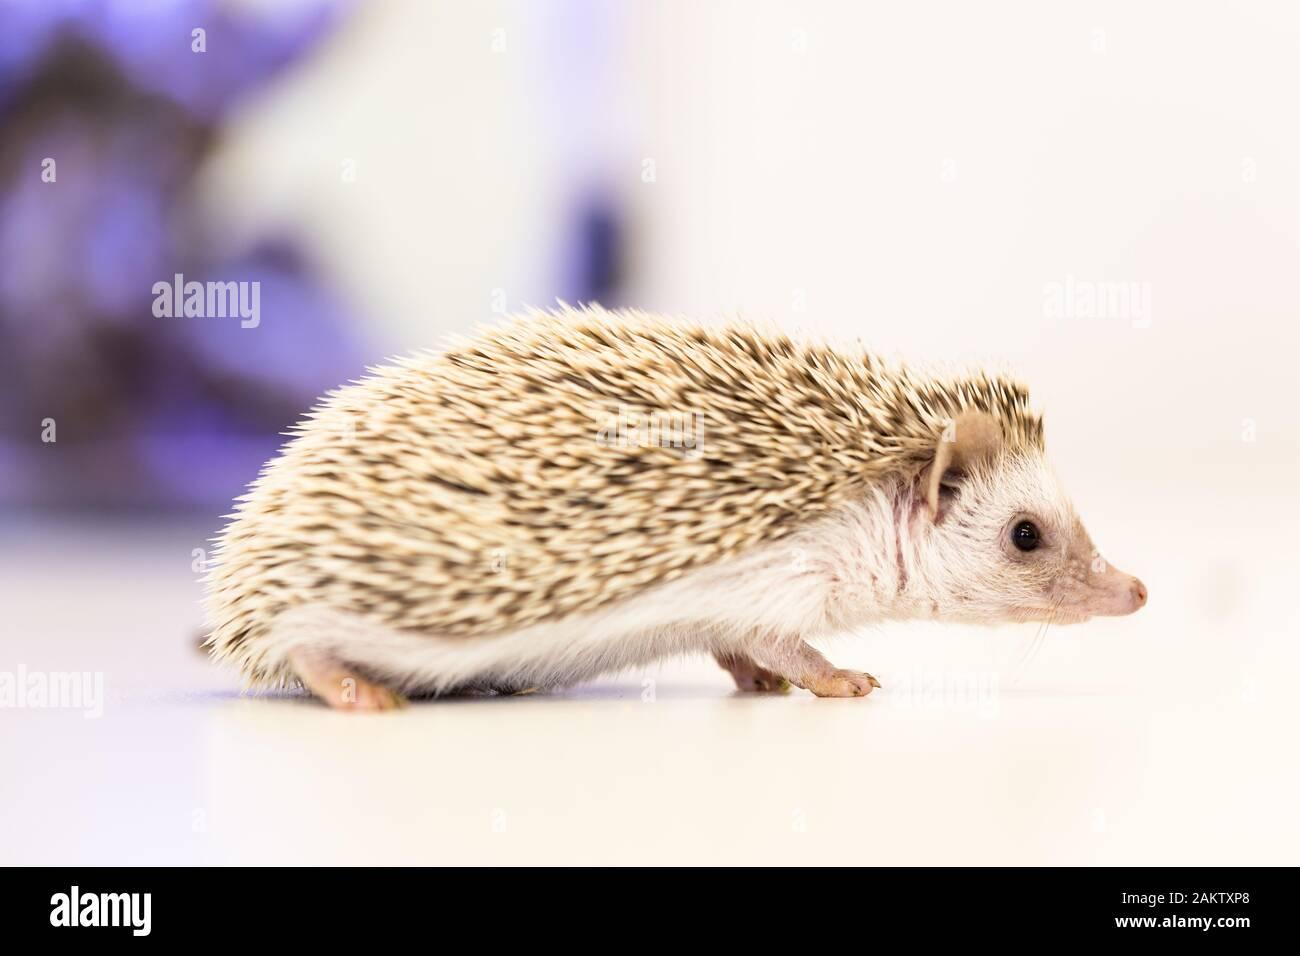 lindo bebé mascota hedgehog sobre una mesa blanca aislada a un fondo blanco. Foto de stock